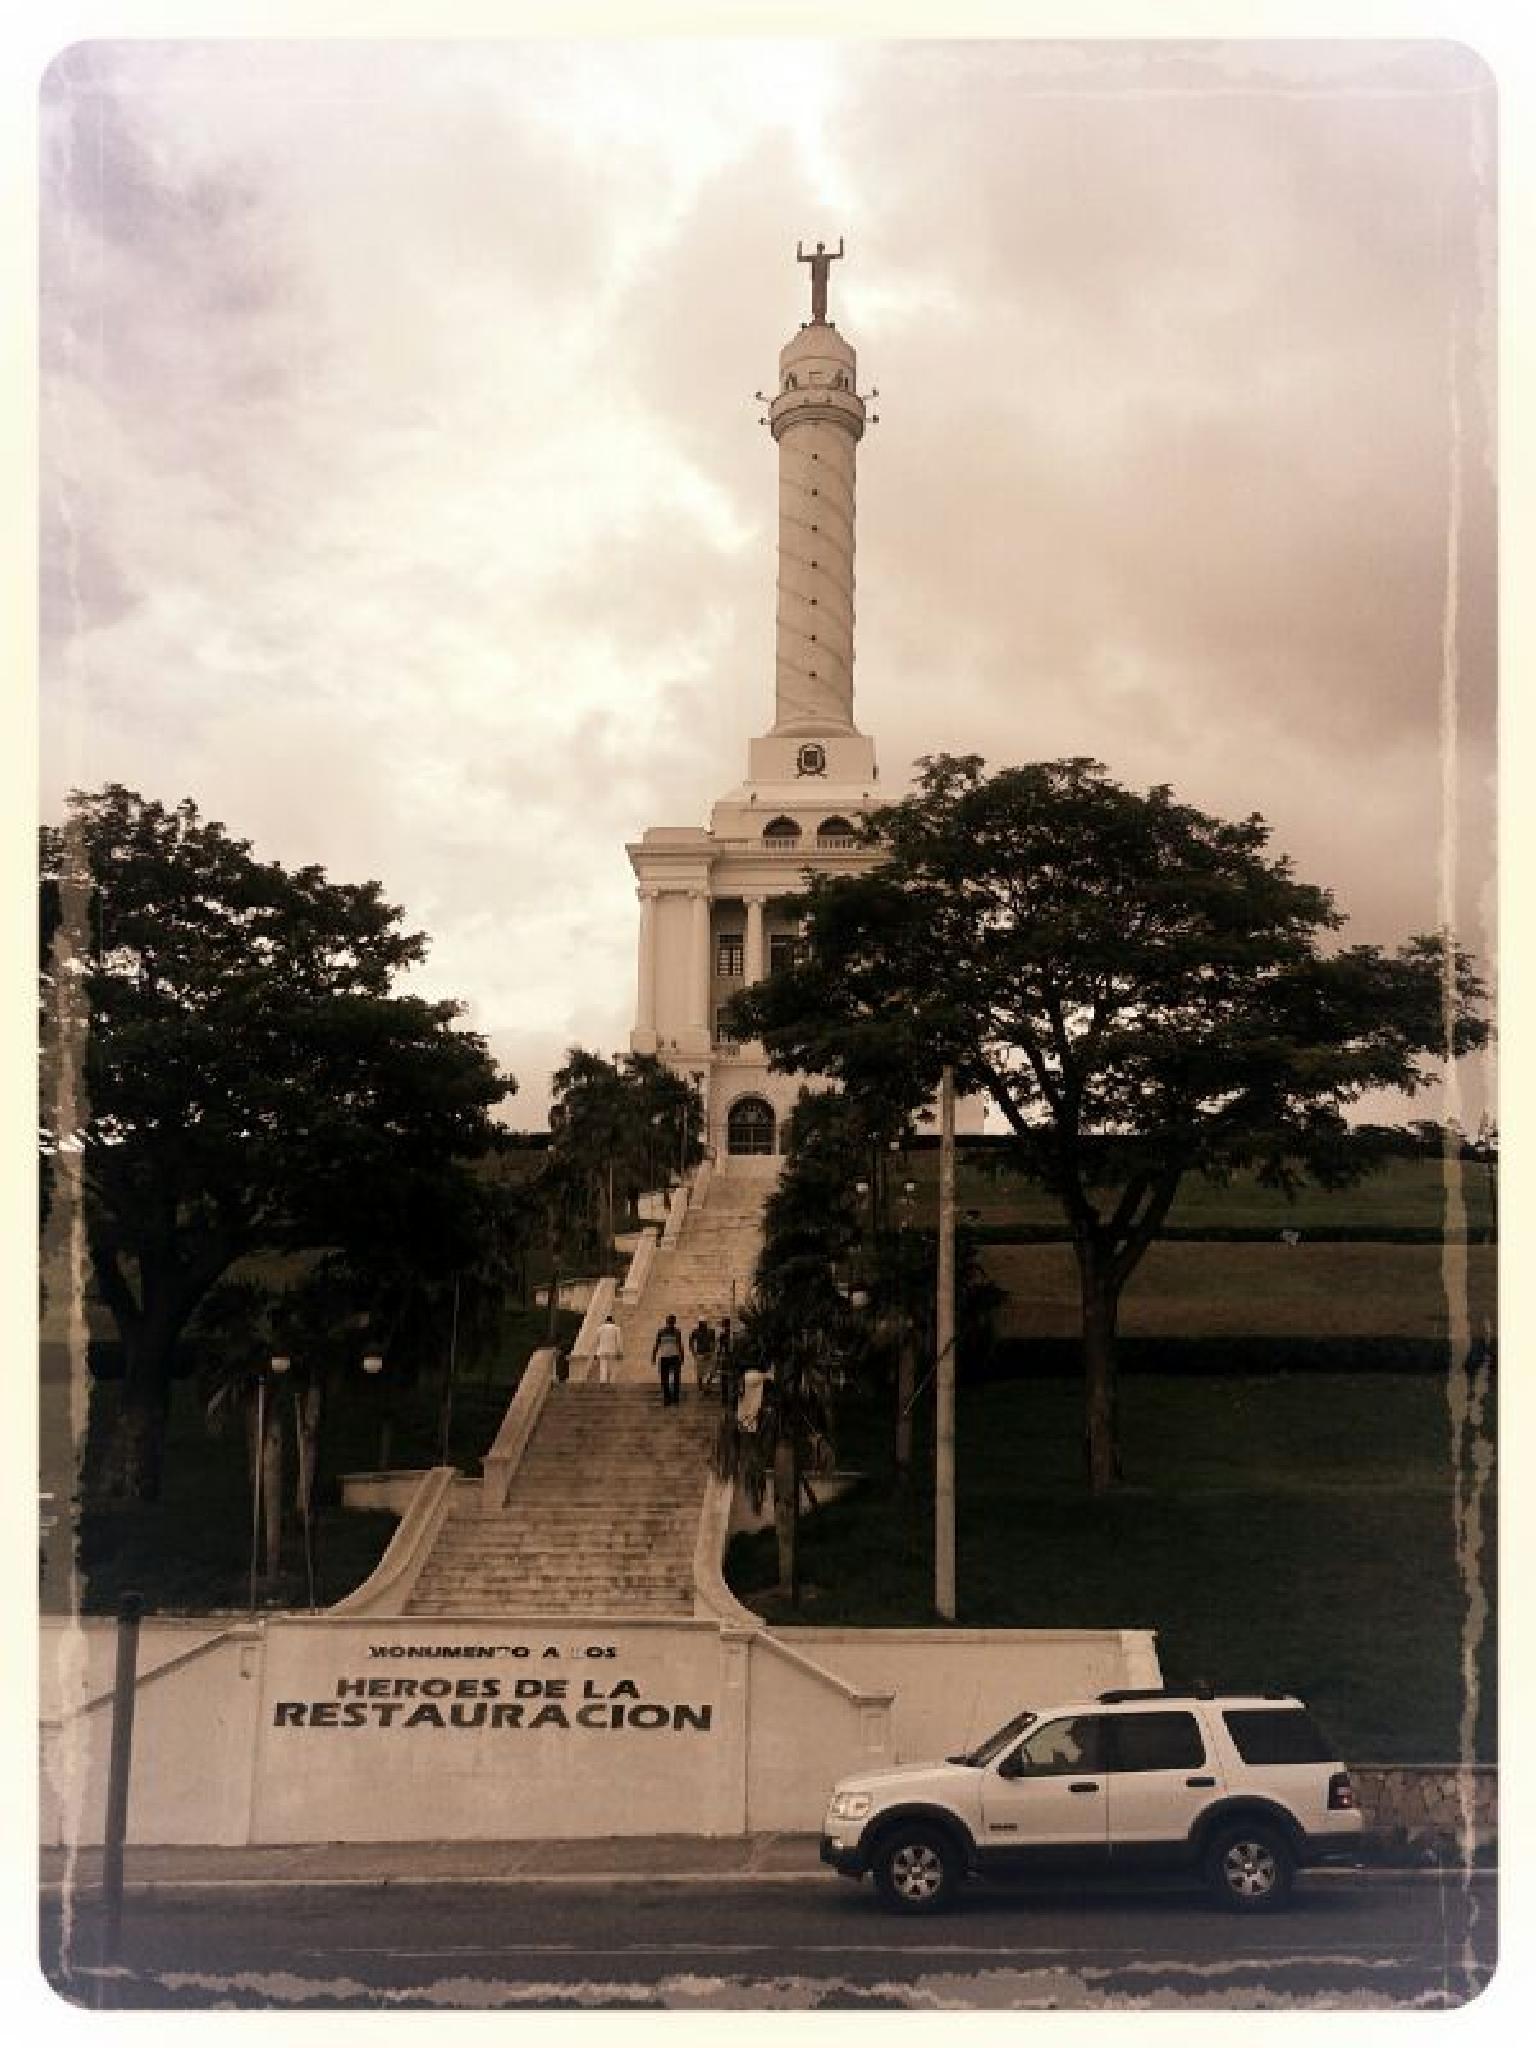 Monumento de Santiago de los Caballeros by Pilar Morillo